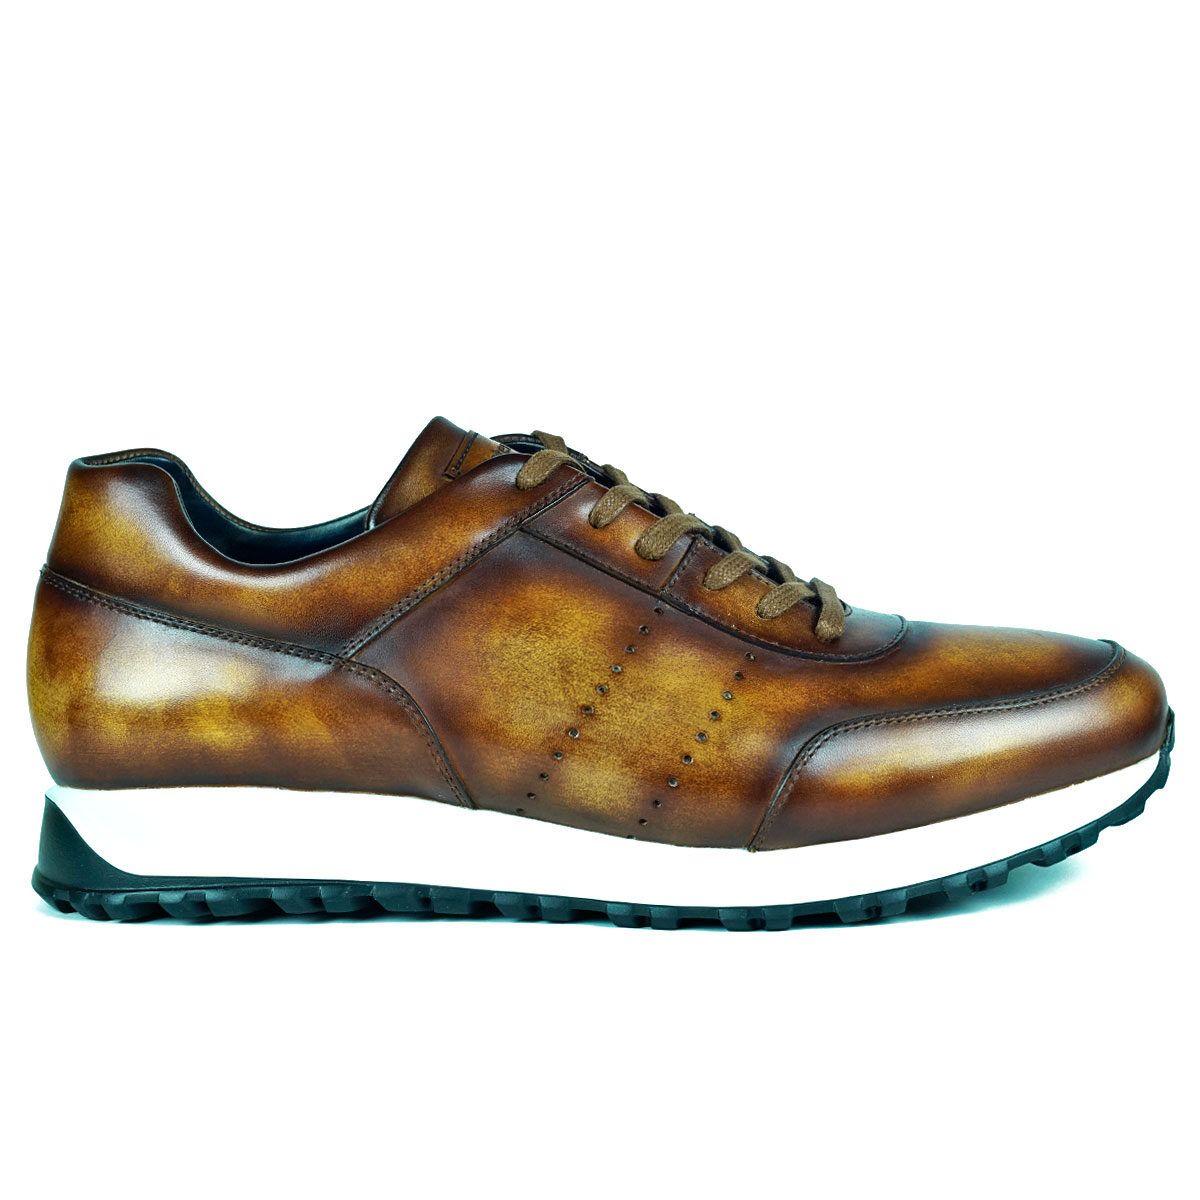 Mens Light Brown (cuero) Sneakers Shoes